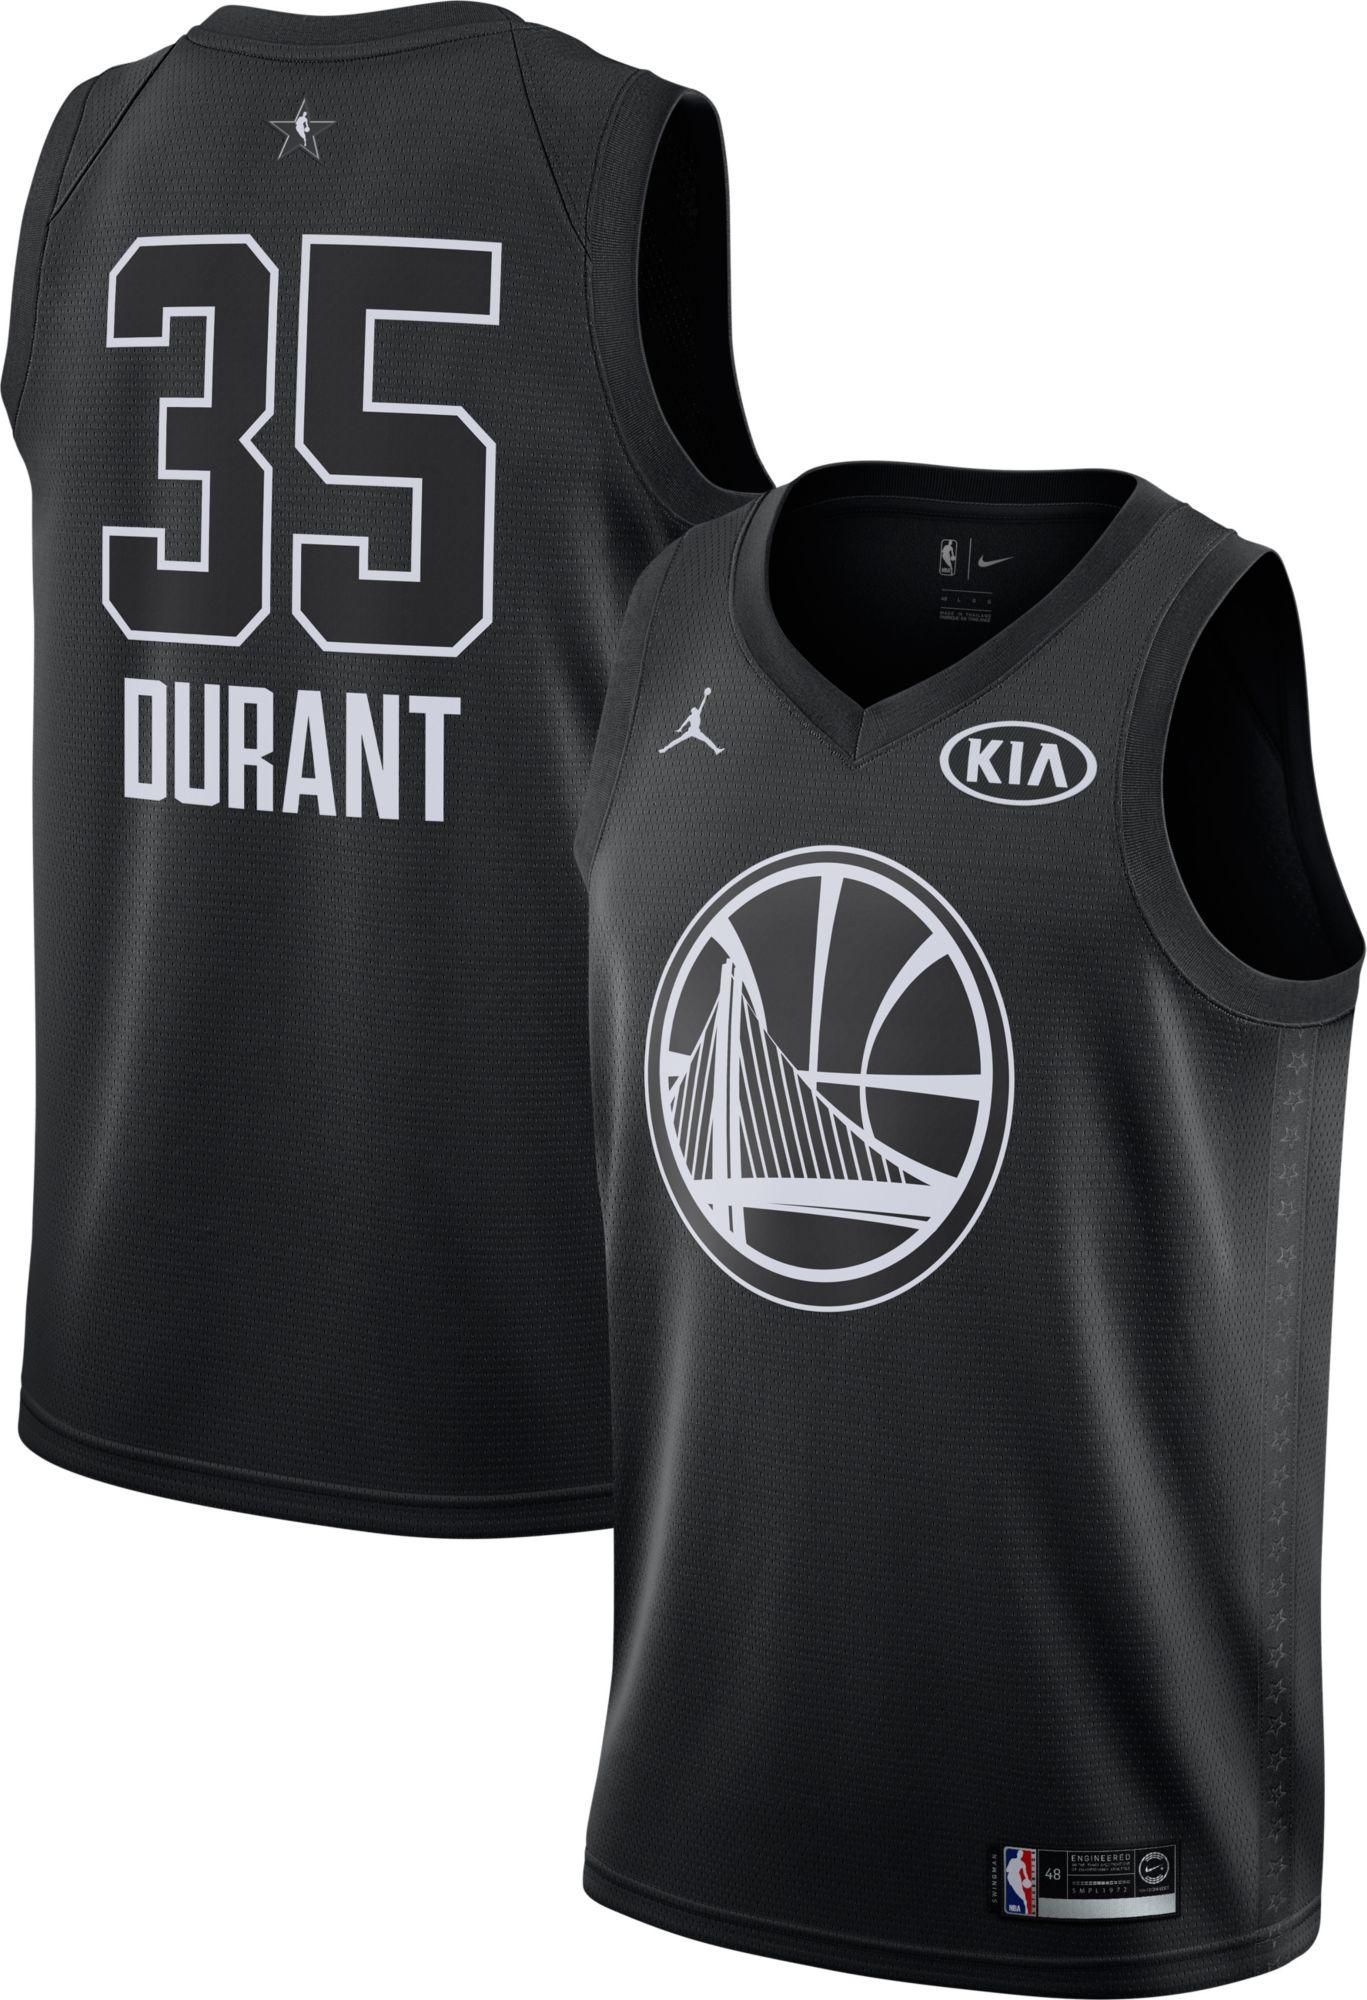 best website 95268 39aa2 Jordan Men's 2018 NBA All-Star Game Kevin Durant Black Dri ...